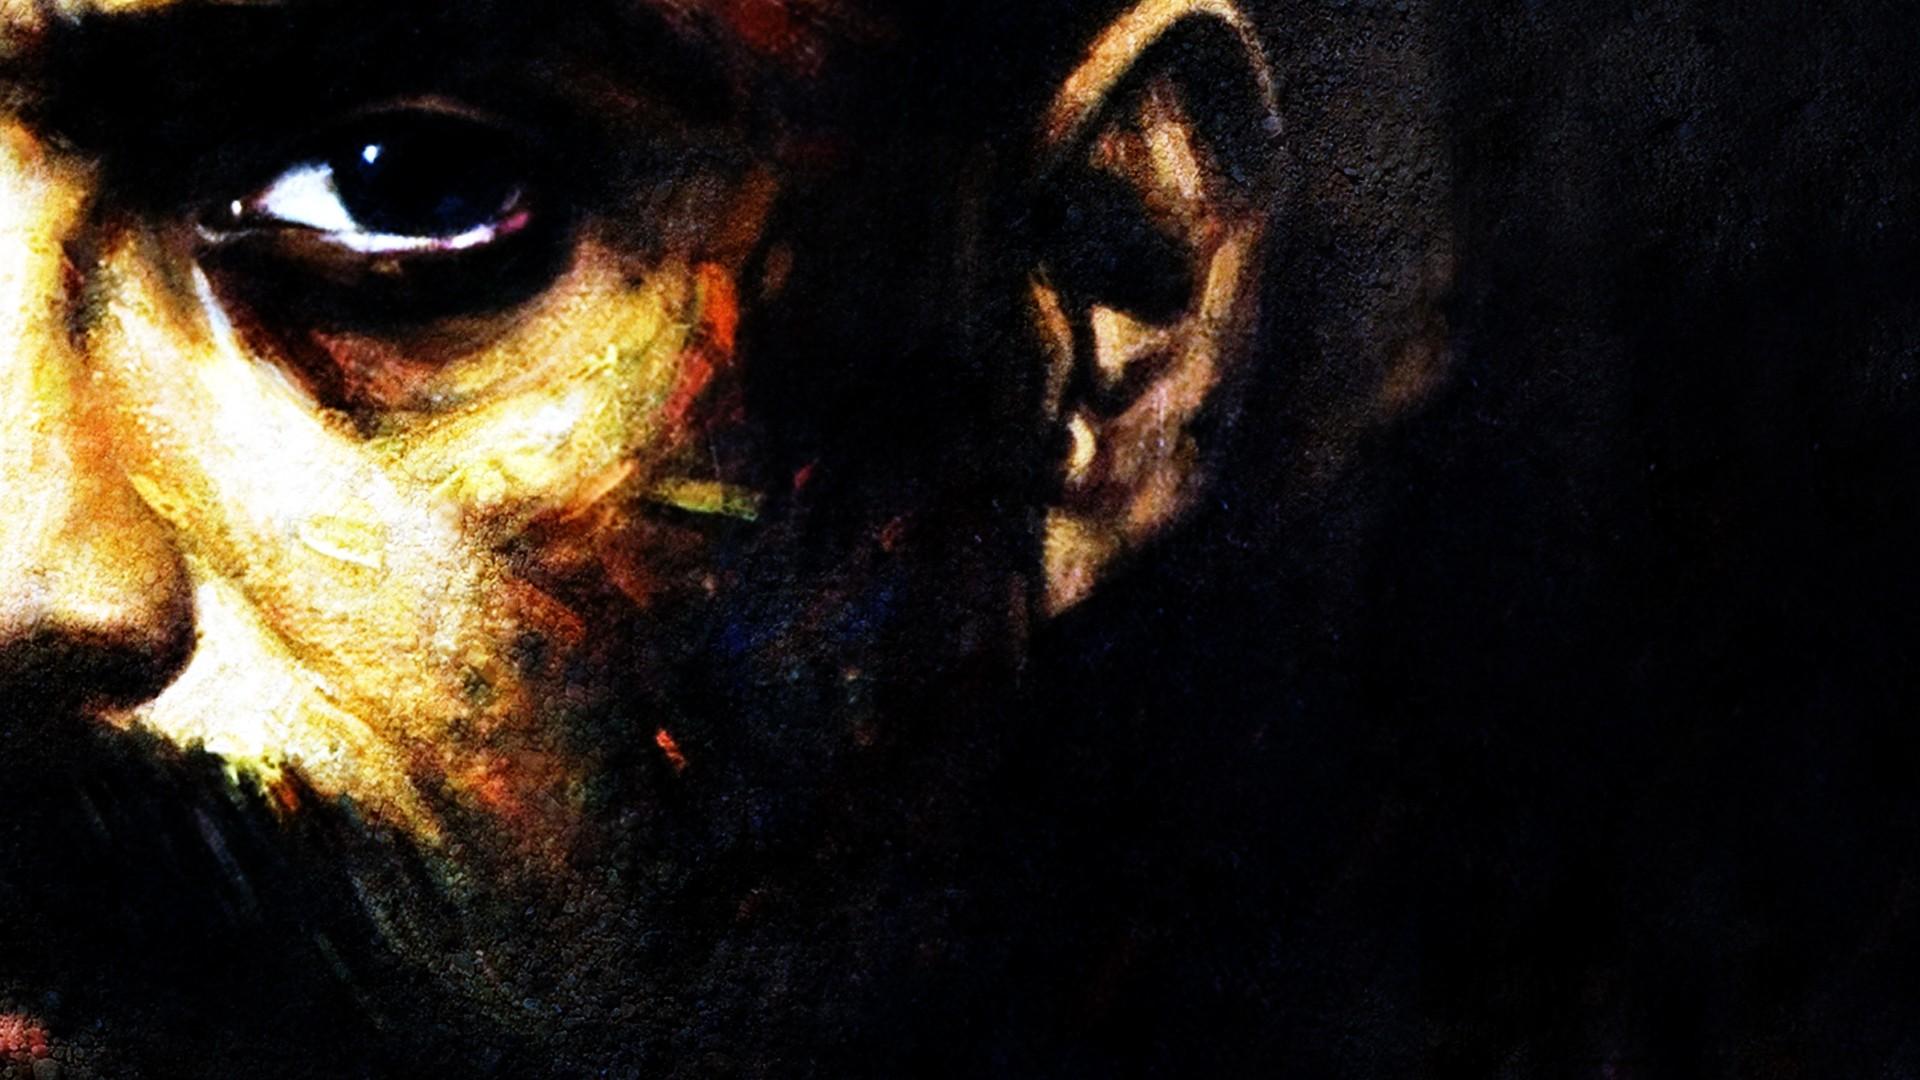 Wallpaper : Painting, Portrait, Artwork, Celebrity